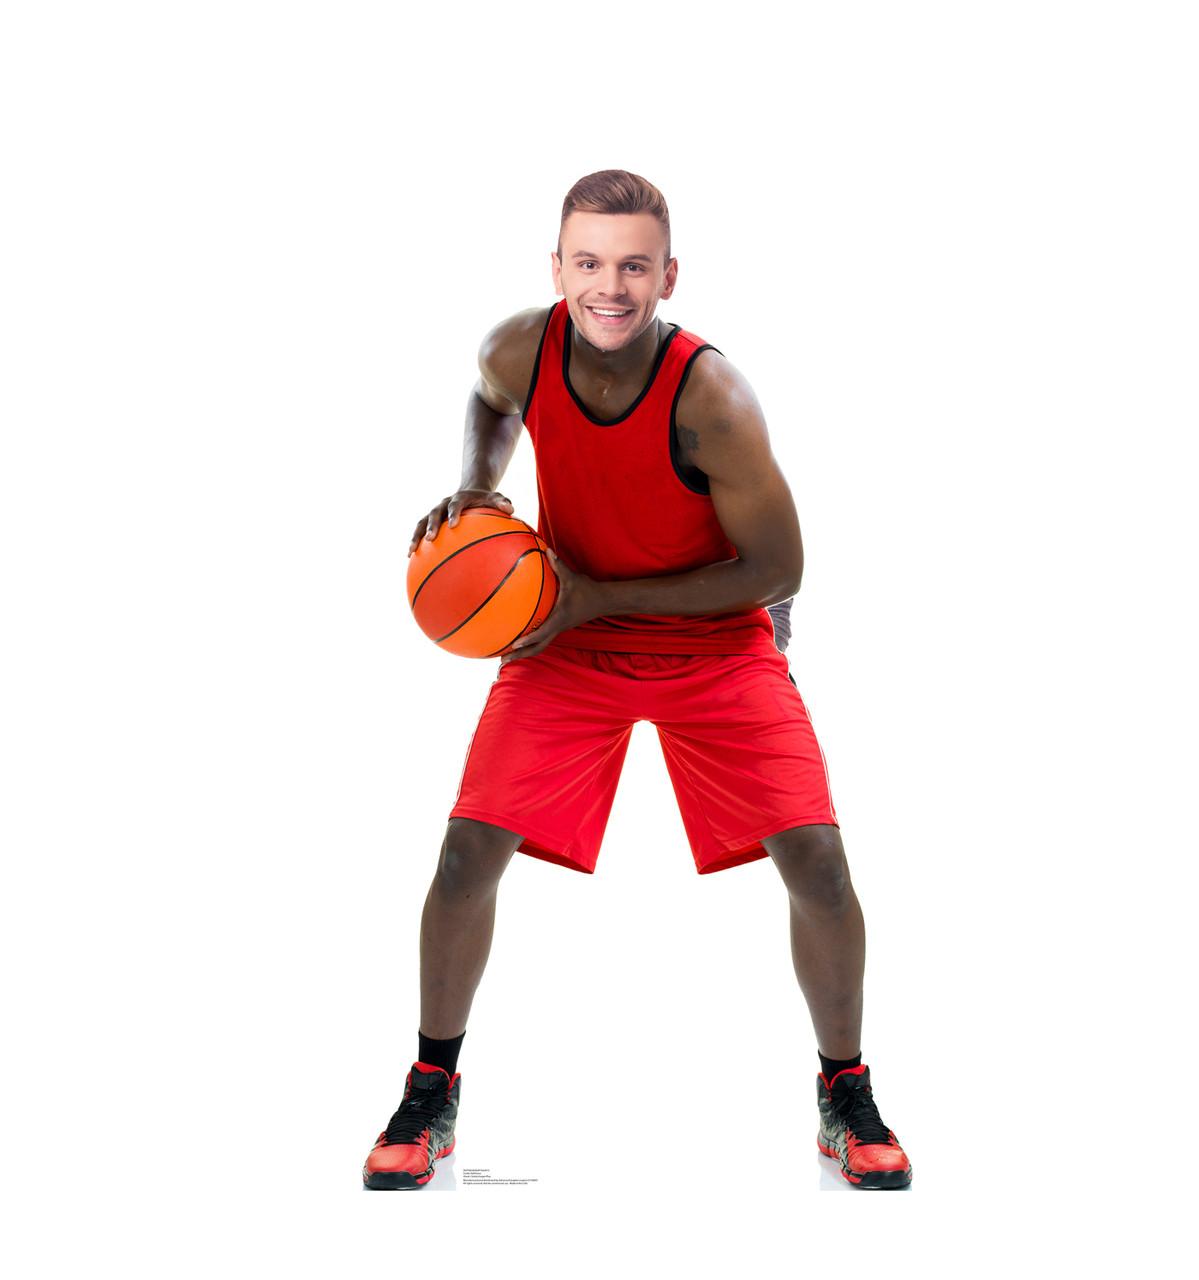 Life-size Basketball Player Stand-In Cardboard Standup | Cardboard Cutout 3